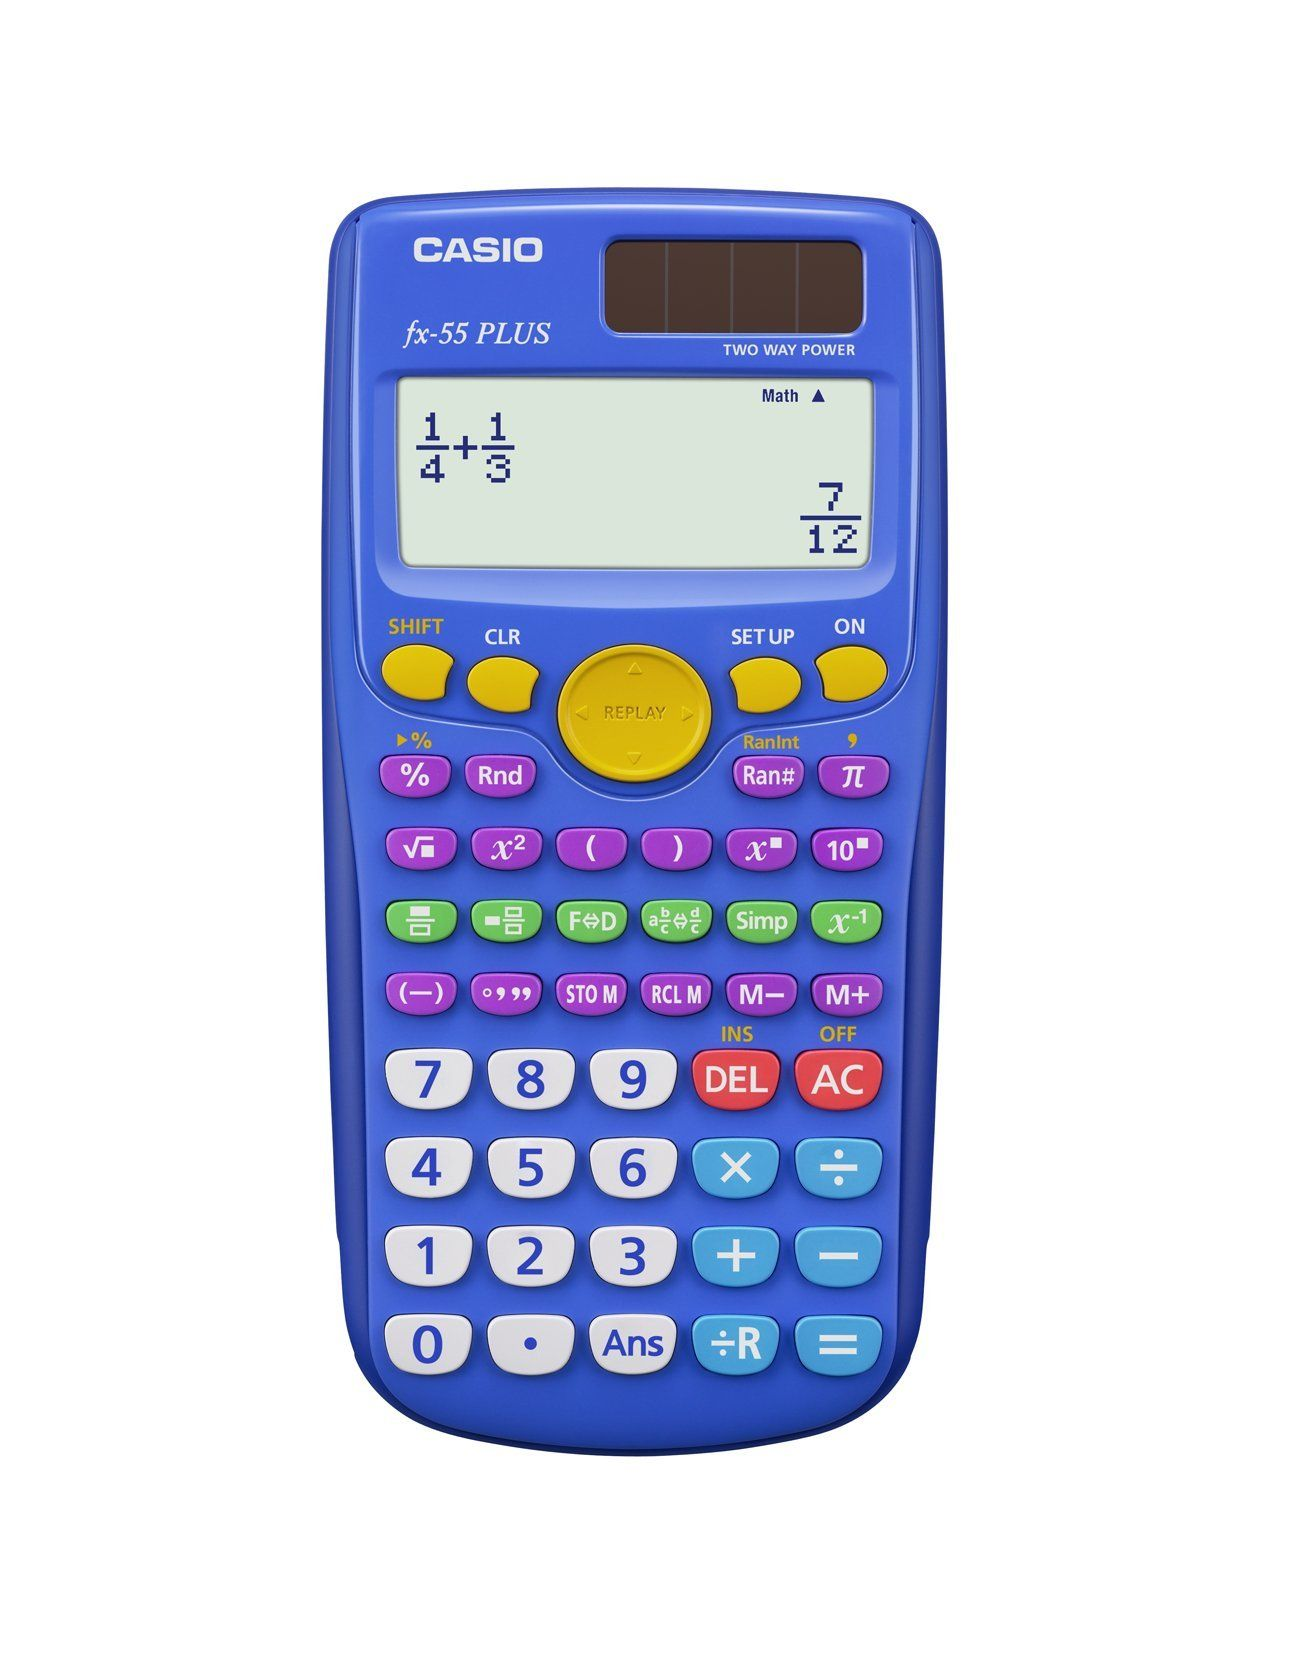 Casio Fx 55 Plus Elementary Middle School Fraction Calculator